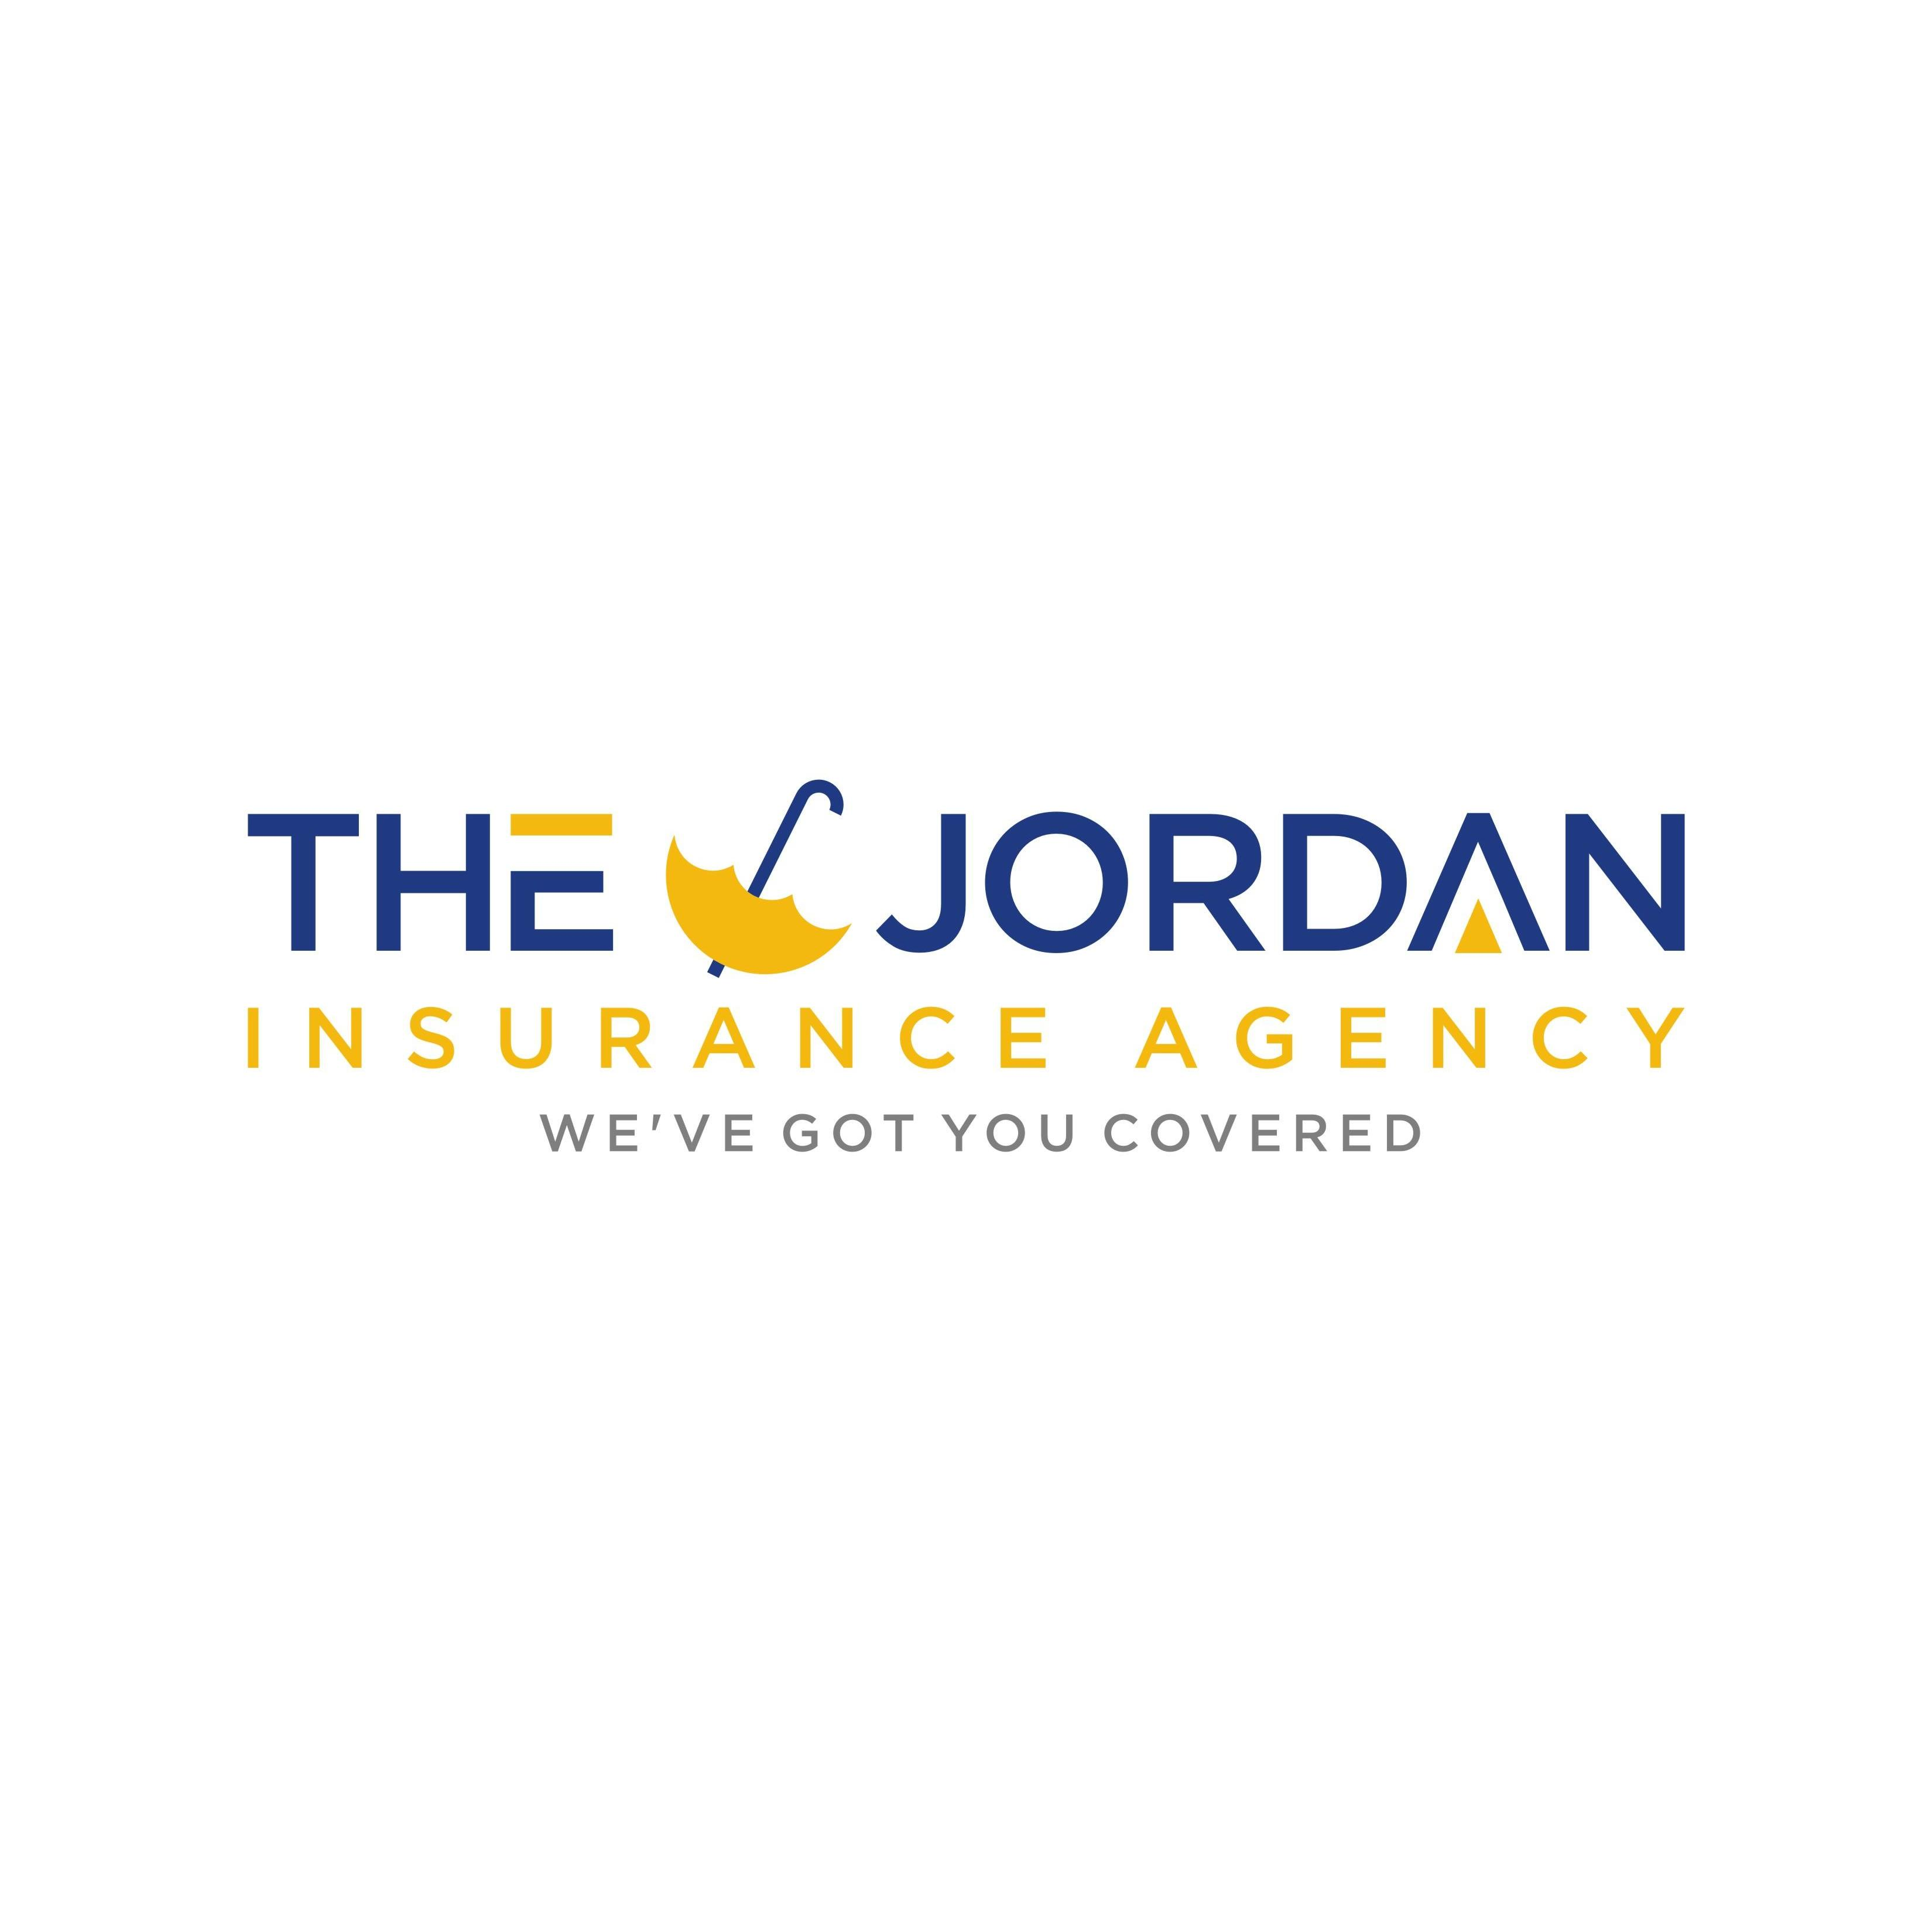 The Jordan Insurance Agency